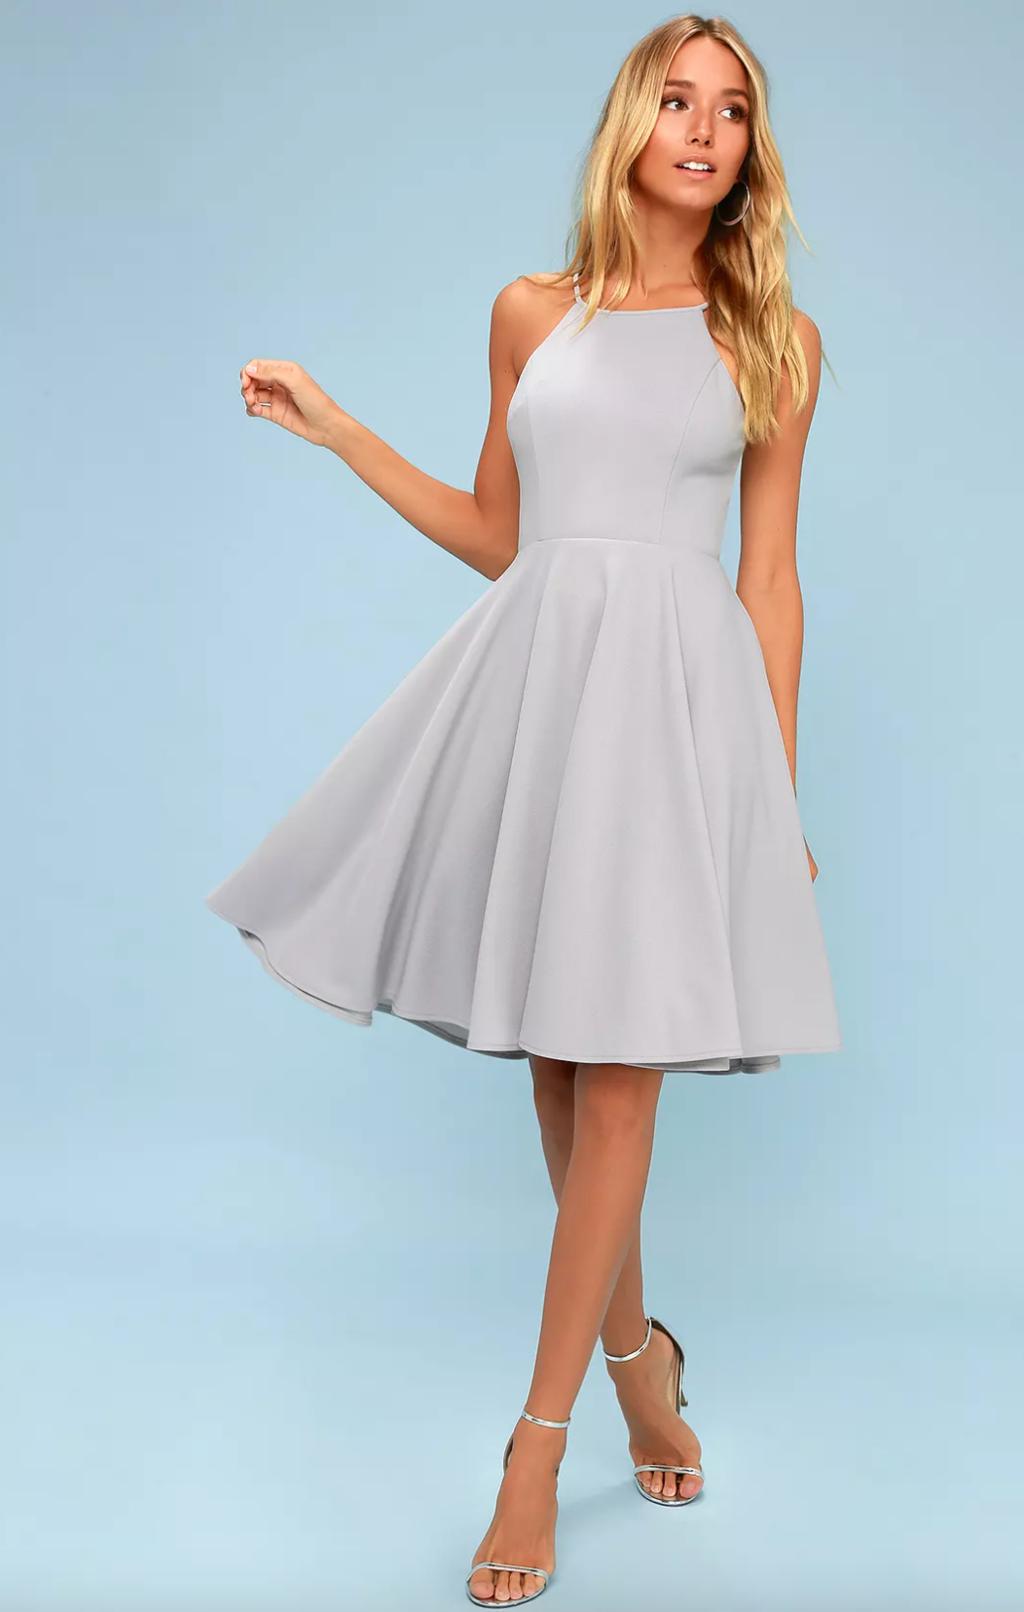 Grey midi dress from Lulu's